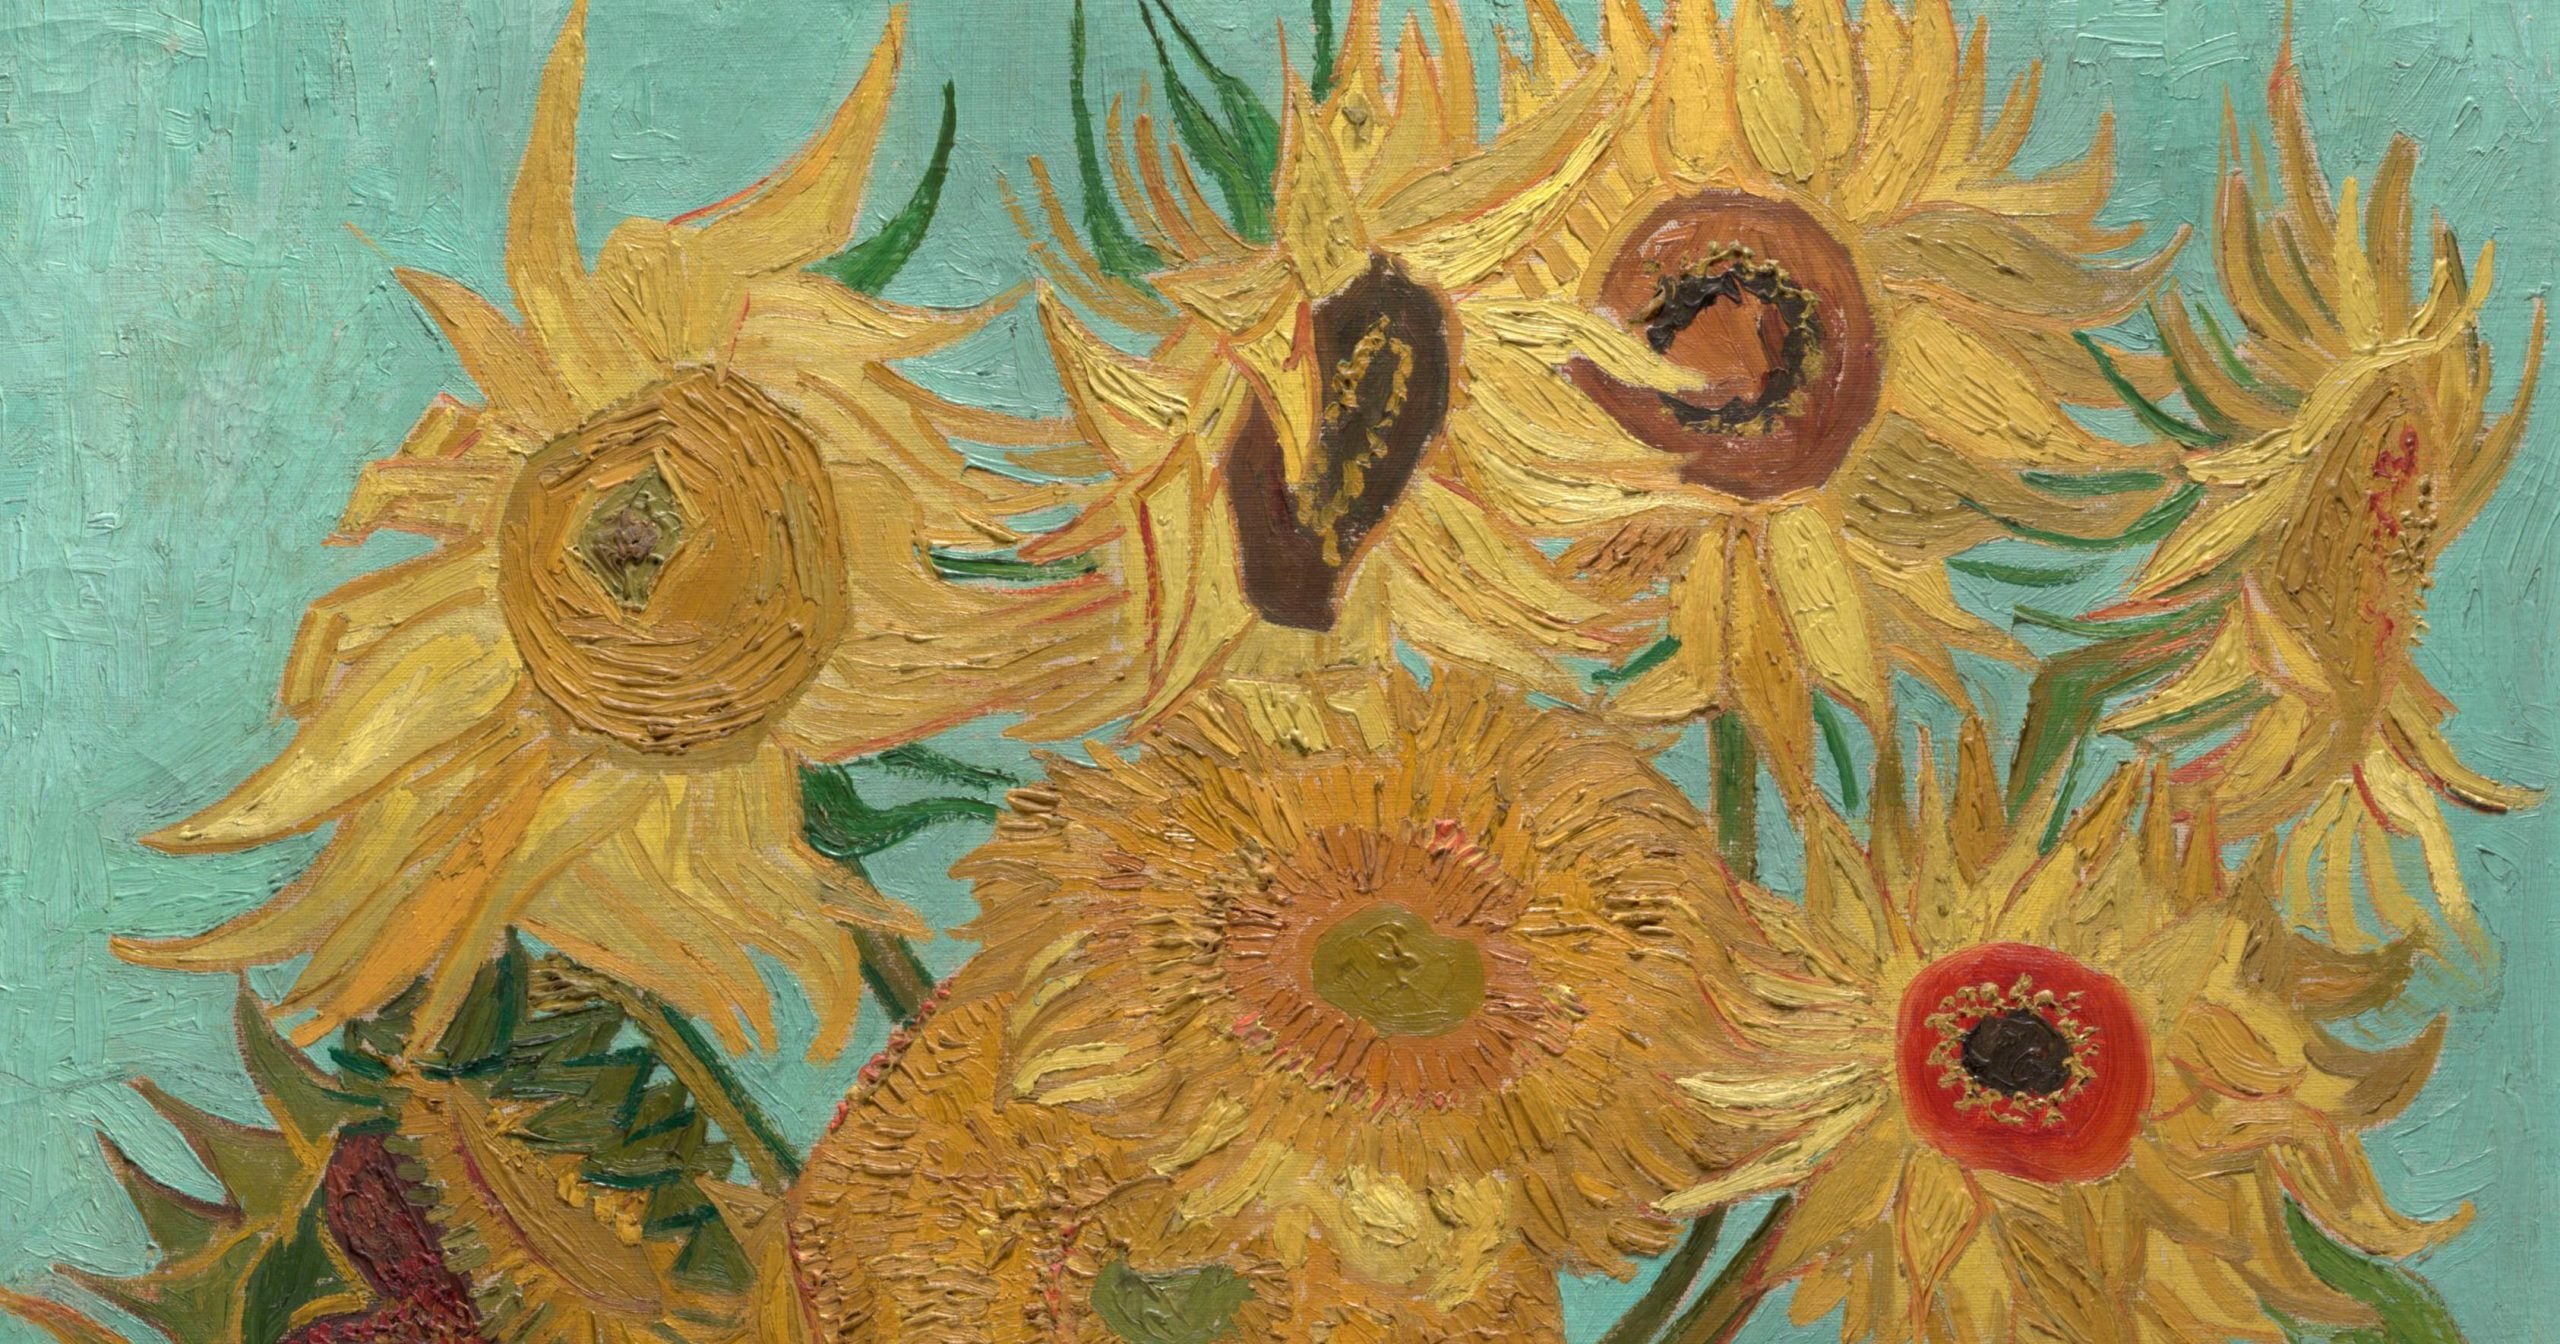 sunflower painting by van gogh balance